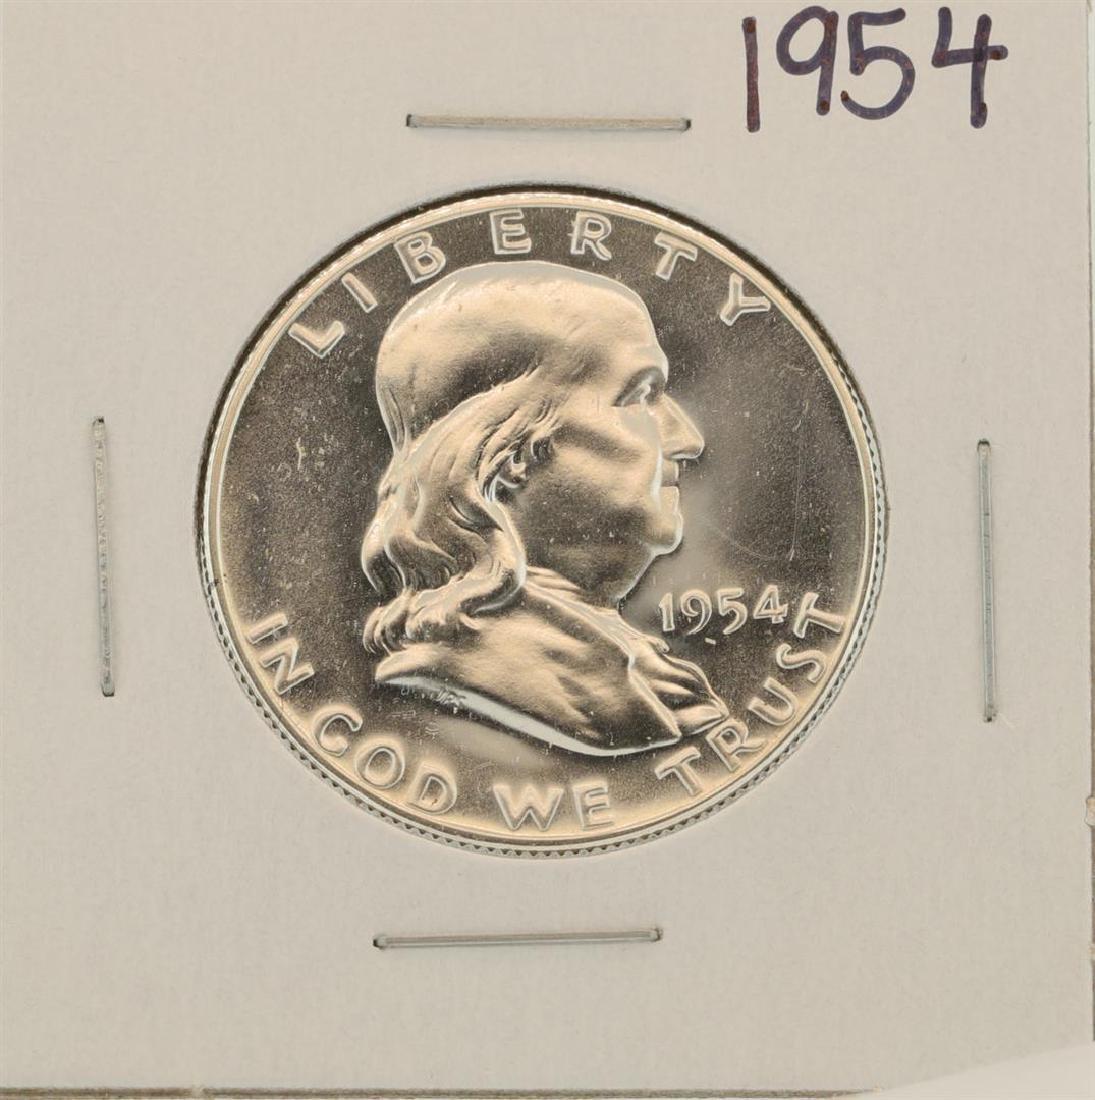 1954 Franklin Half Dollar Proof Coin